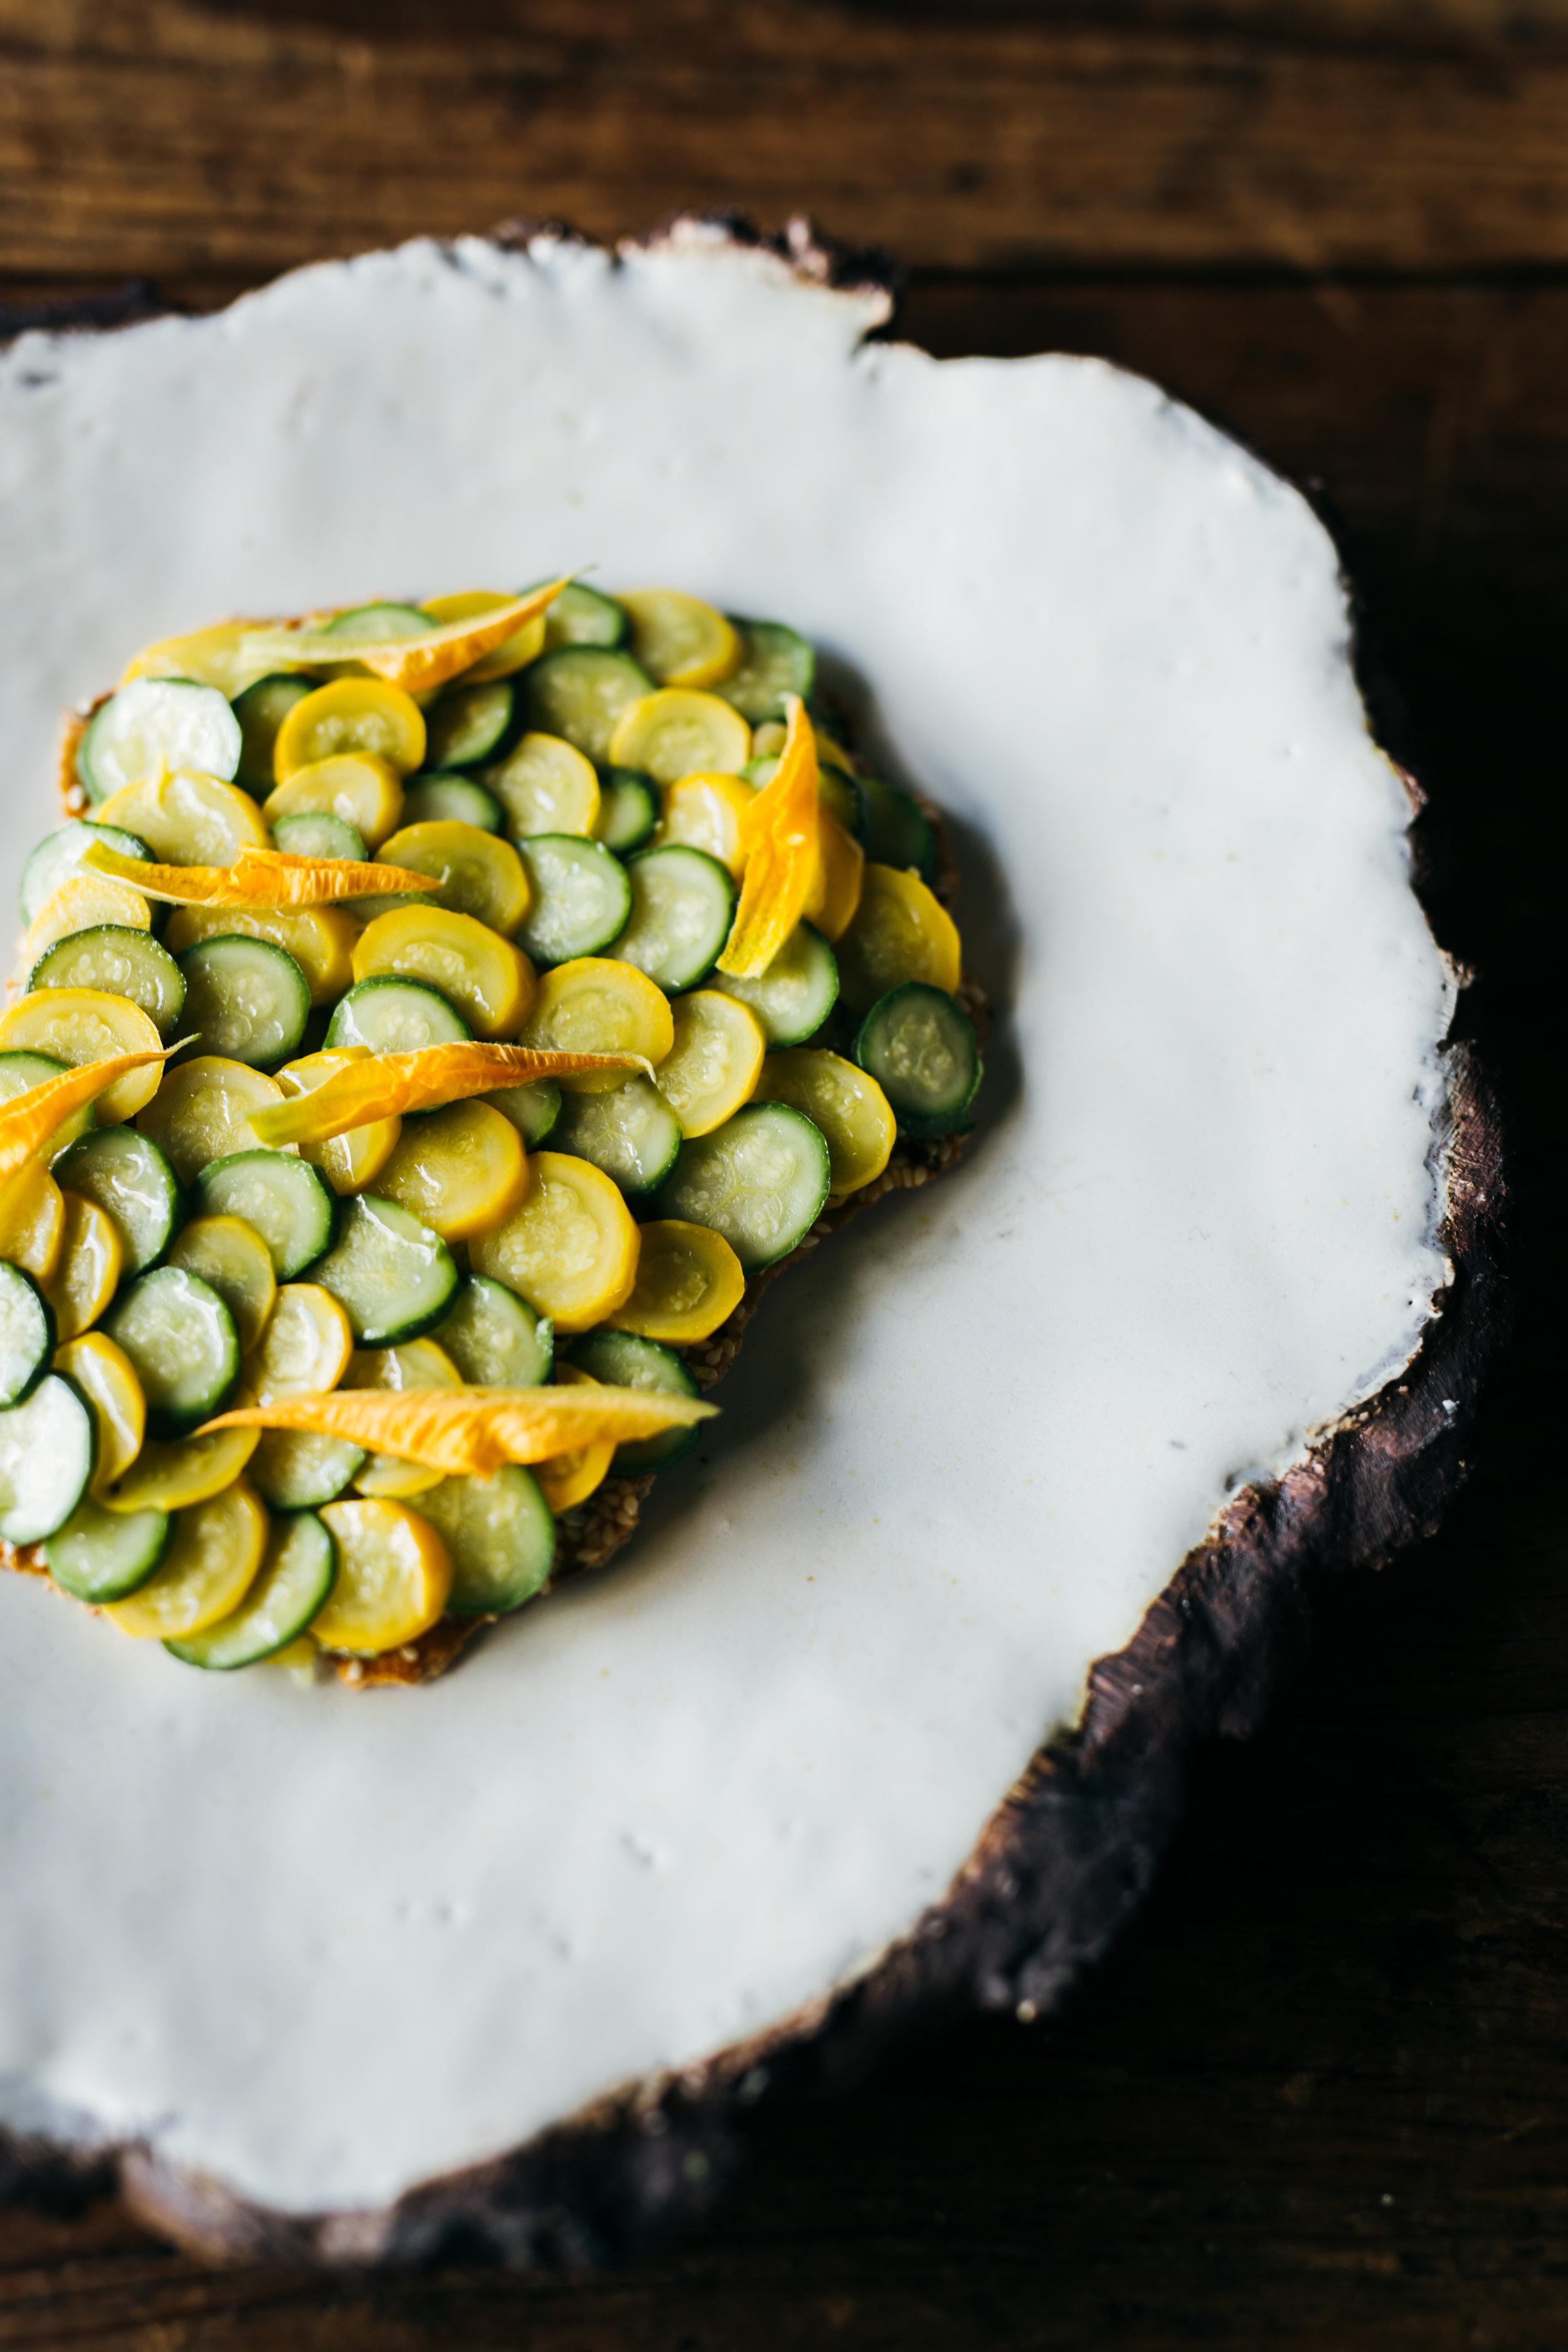 potato and summer squash pizza - ingrid hofstra photographer..jpg